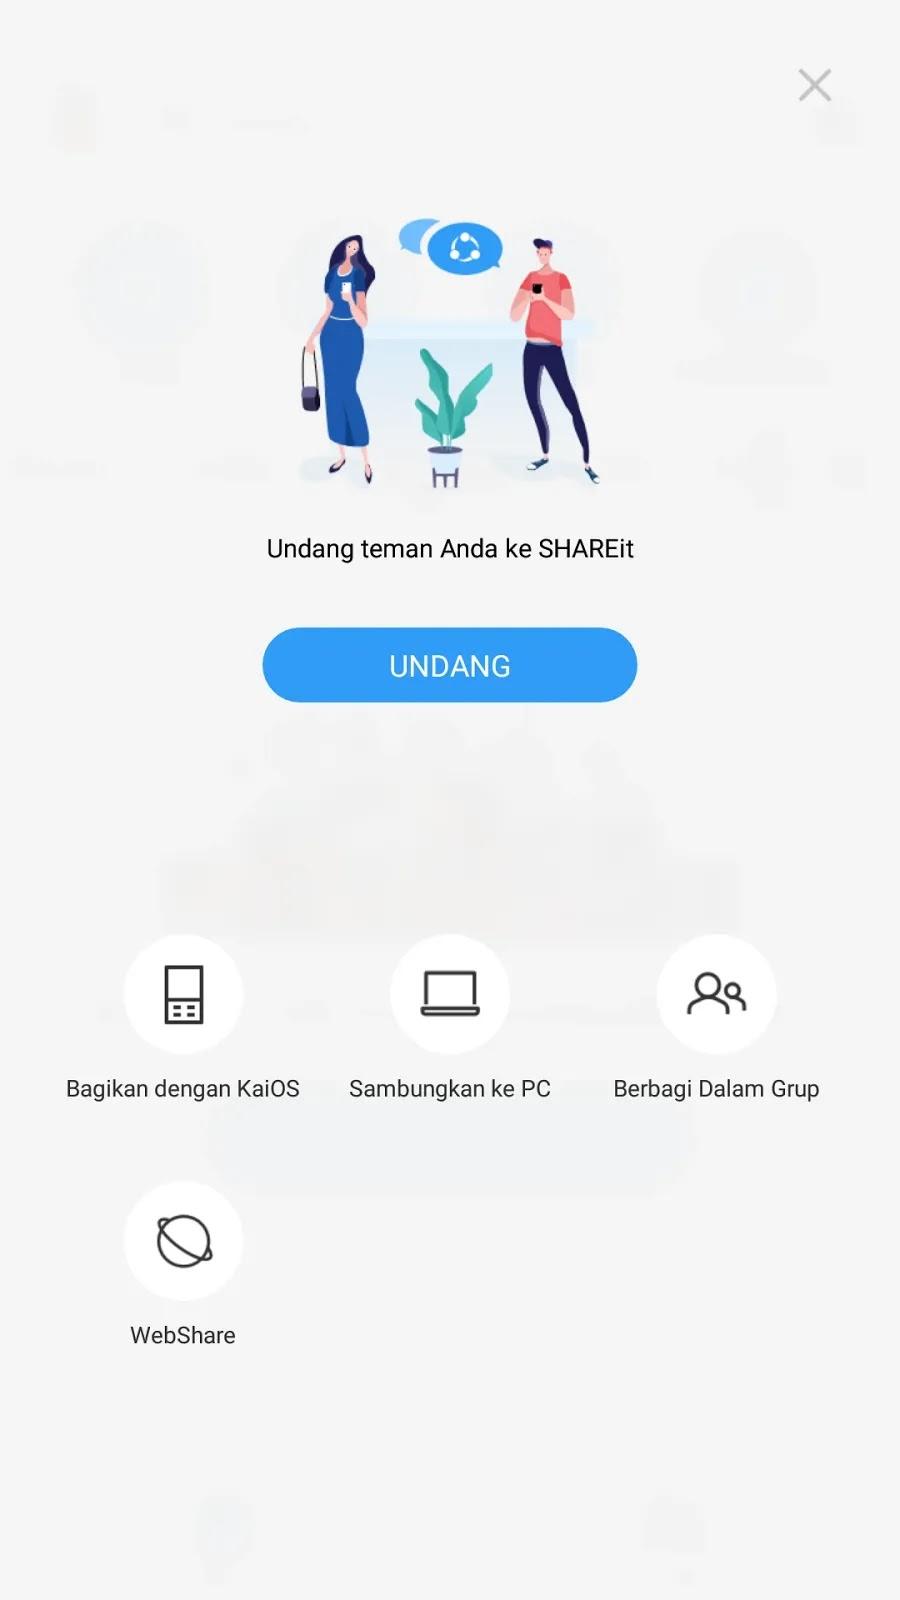 cara-menggunakan-webshare-pada-aplikasi-android